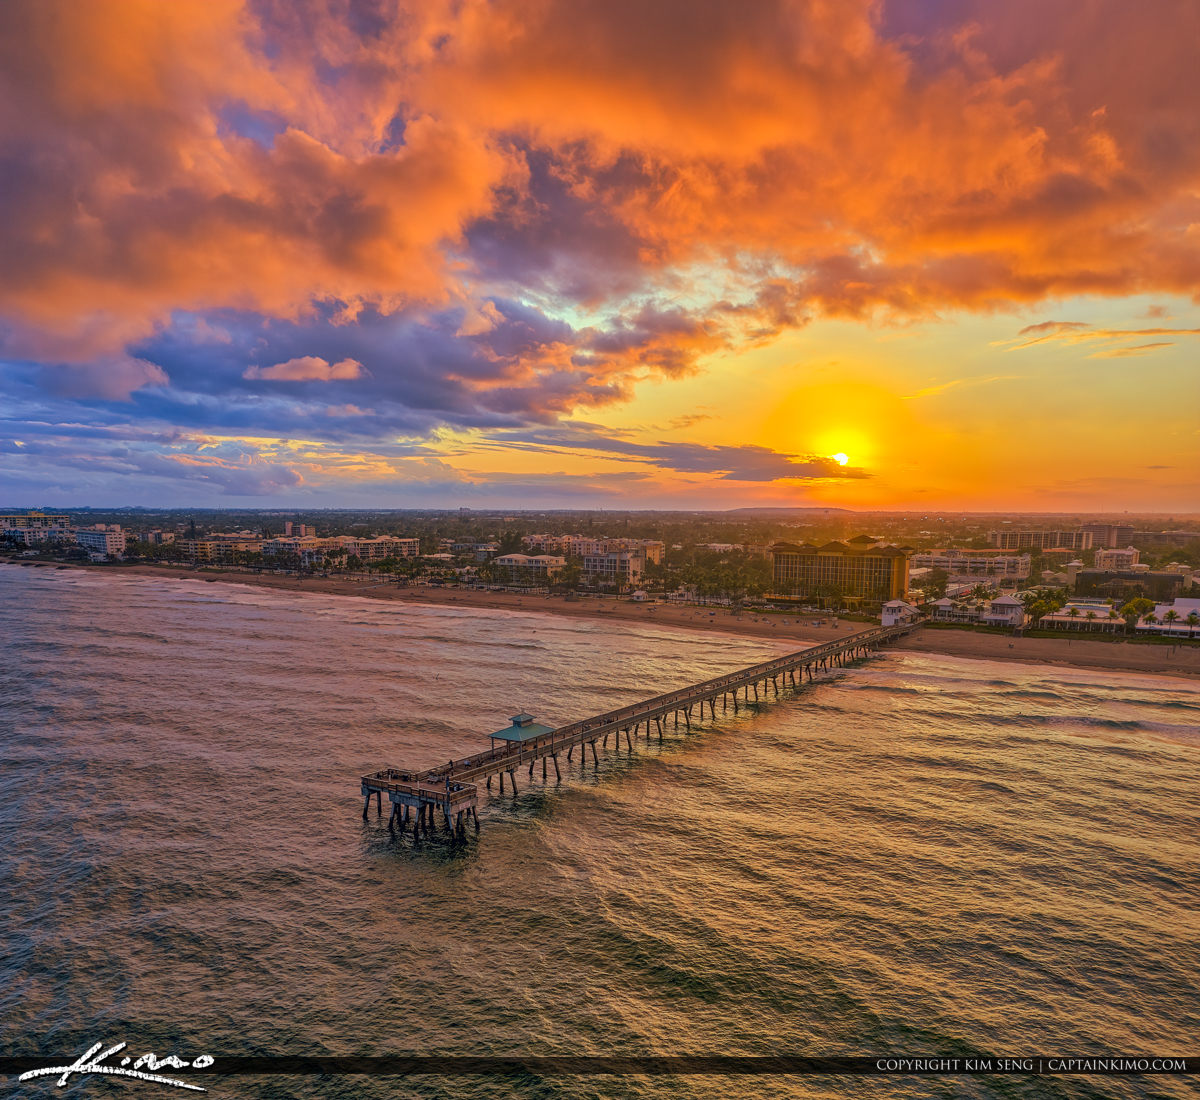 Deerfield Beach International Fishing Pier Sunset Aerial